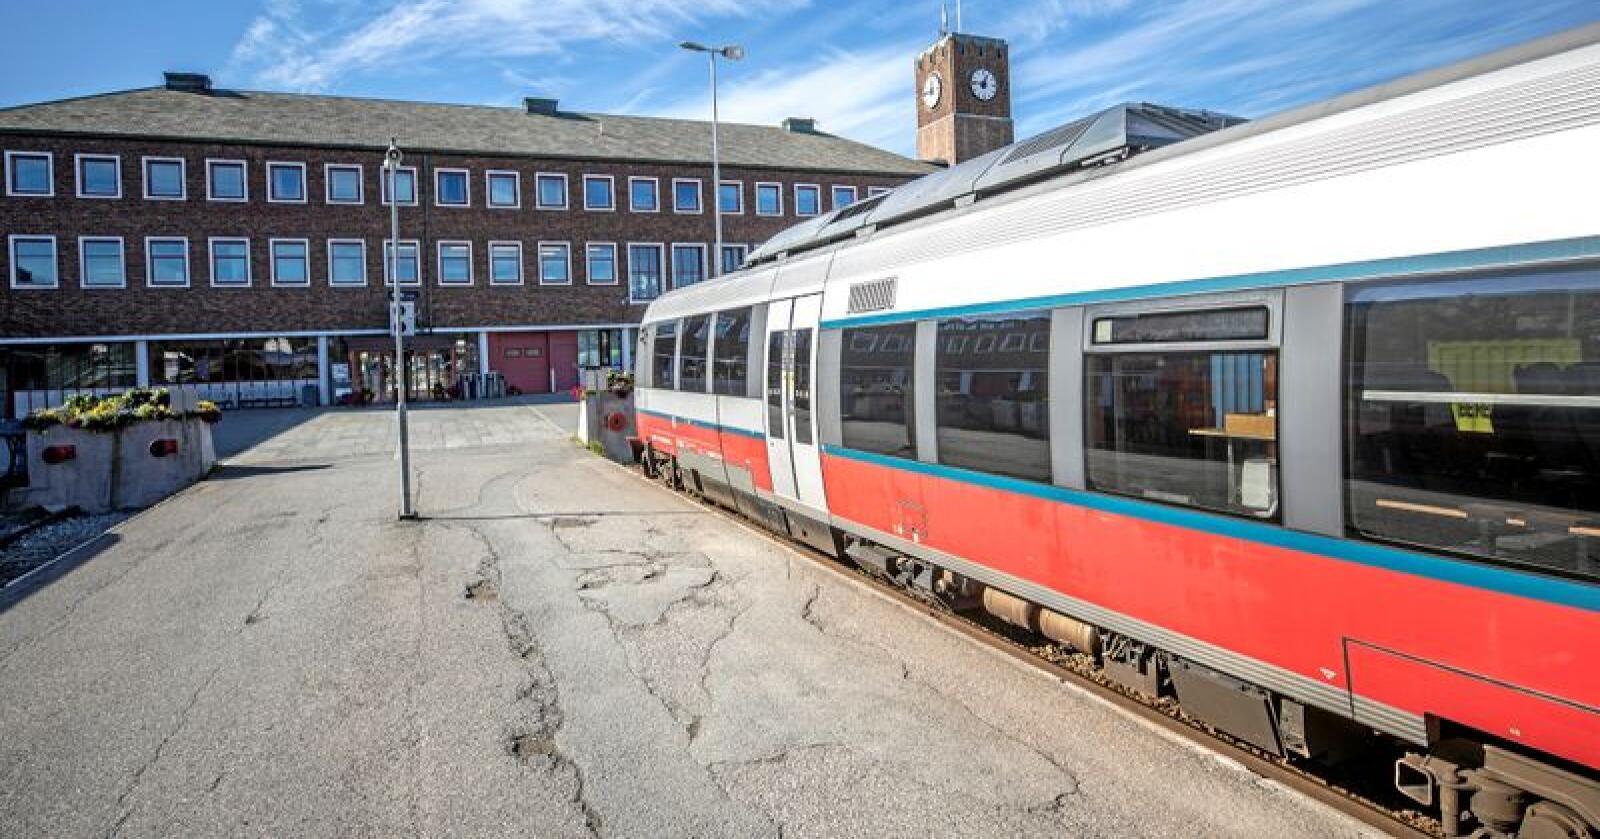 Hit, men ikke lenger: Nordlandsbanen stopper i Bodø. Foto: Per-Inge Johnsen / NTB scanpix